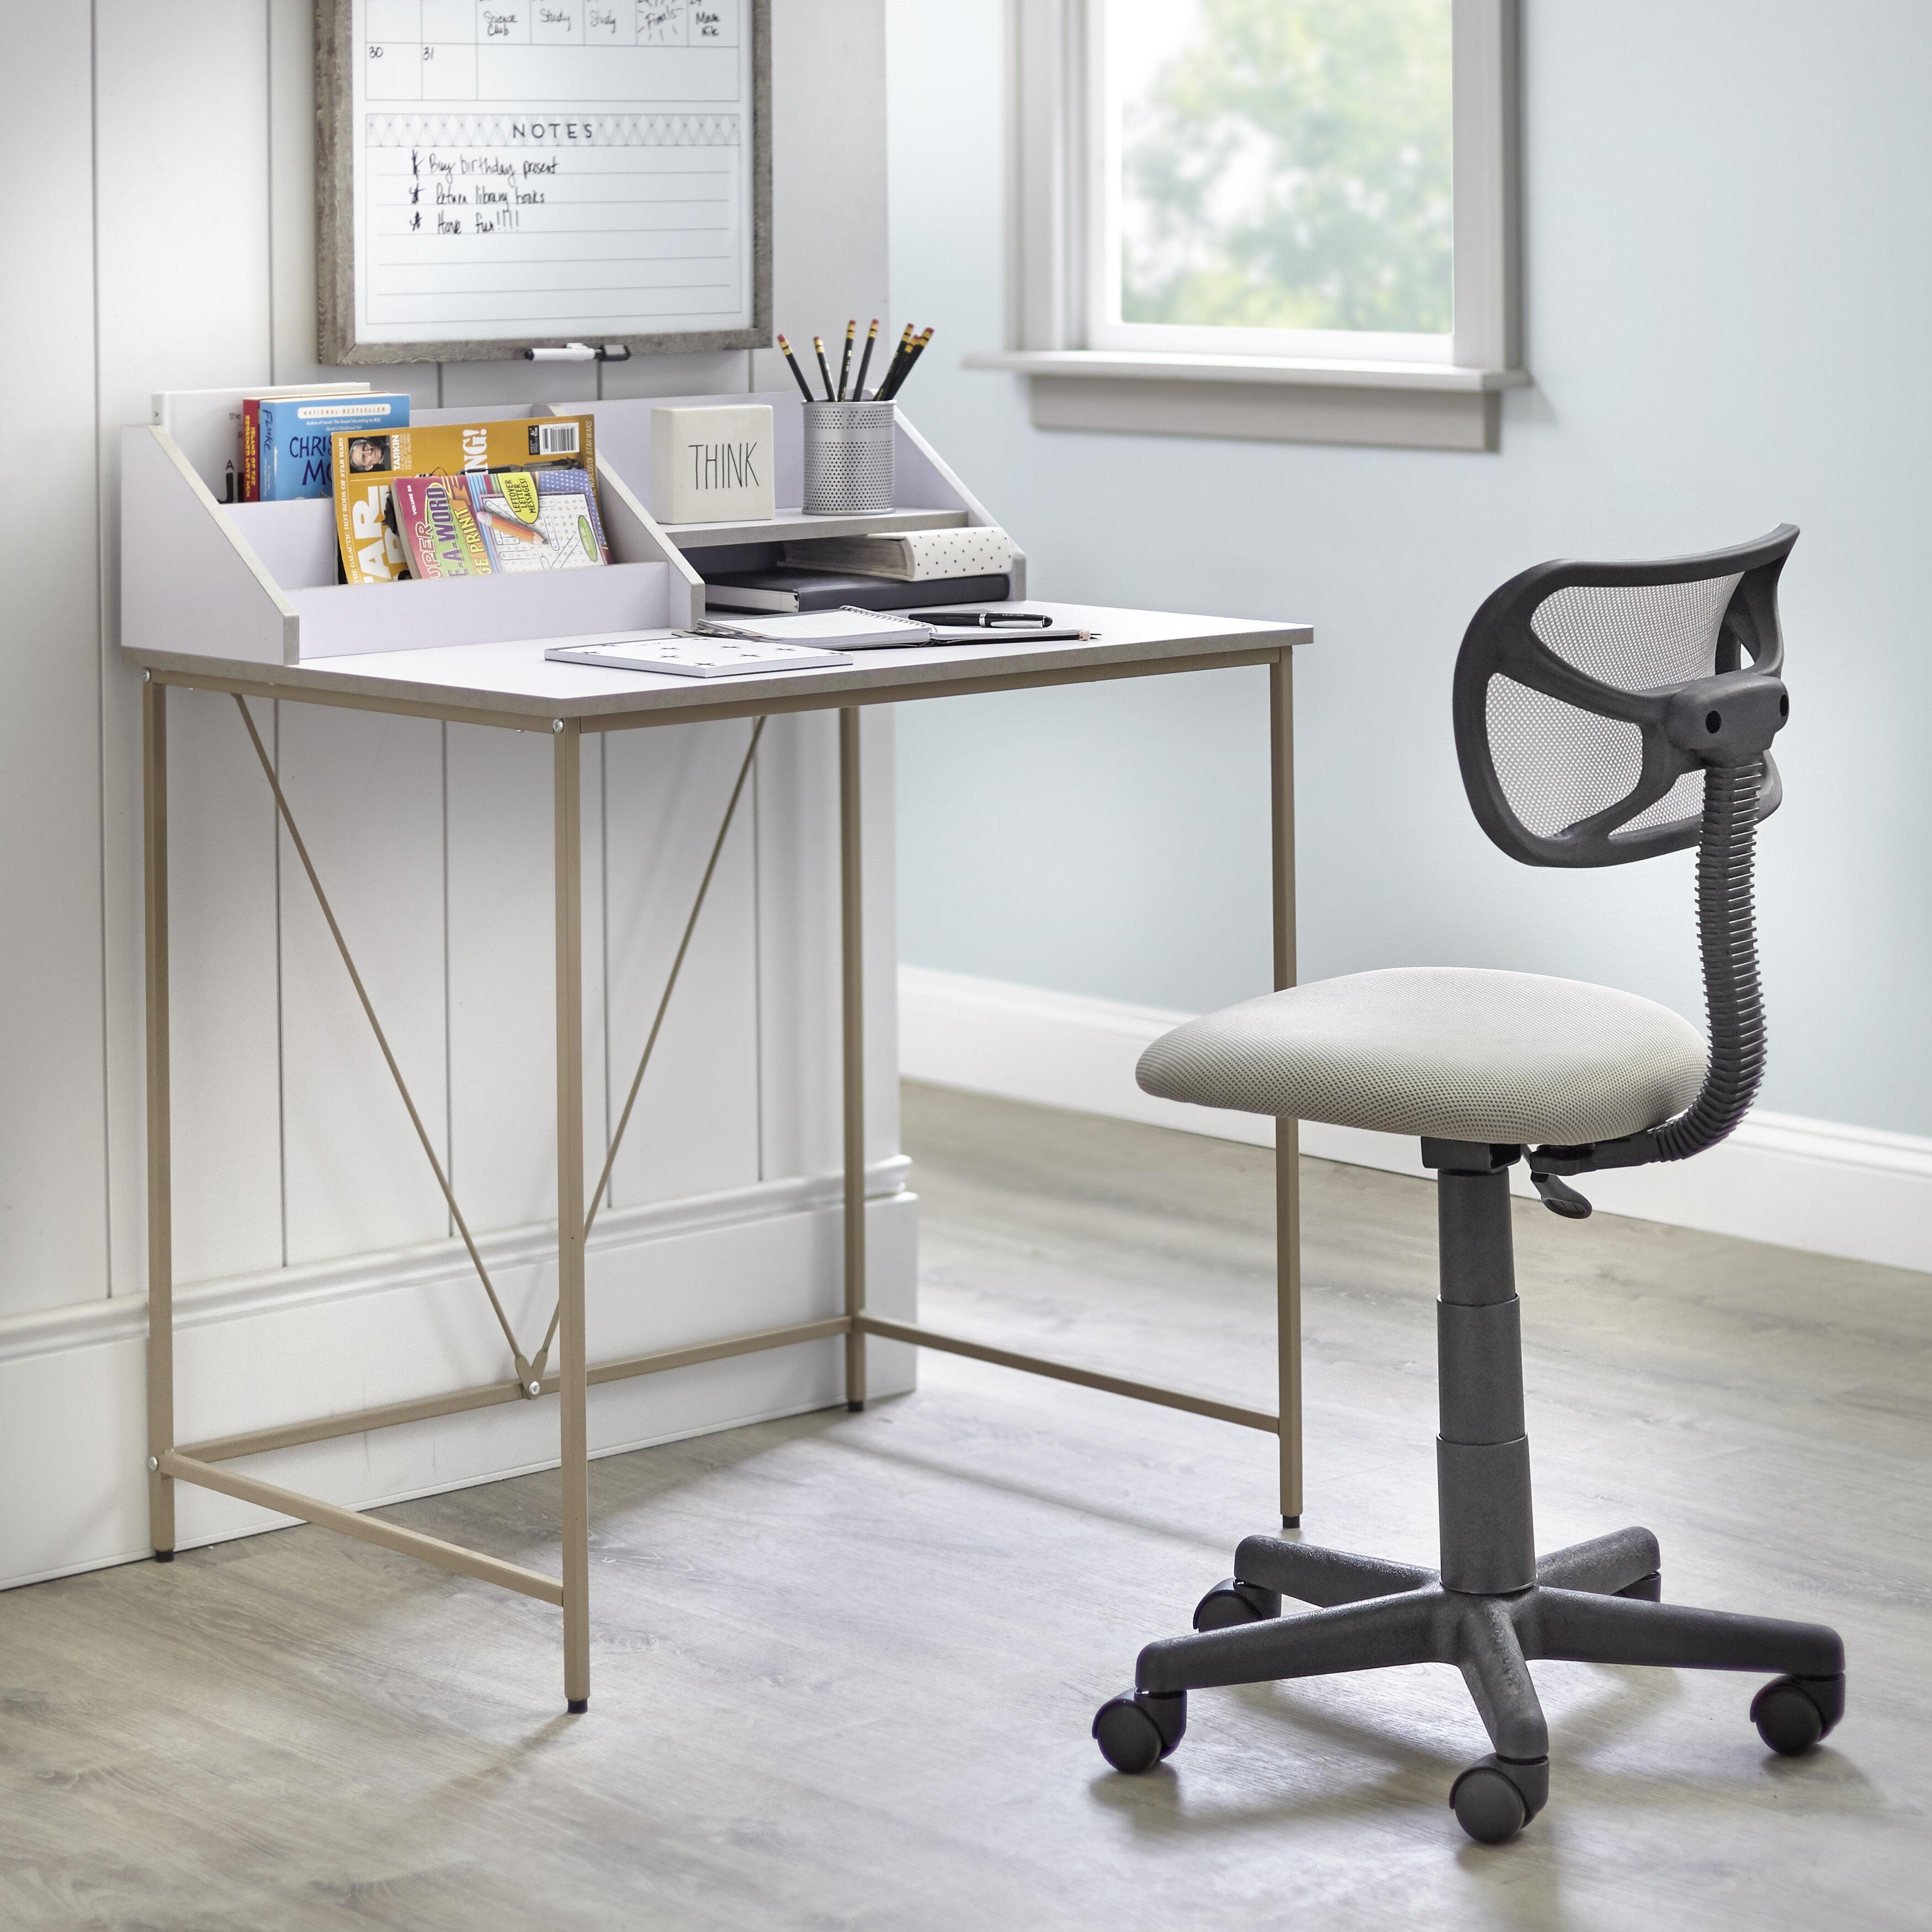 Cool Ebern Designs Morgane Desk And Chair Set Reviews Wayfair Creativecarmelina Interior Chair Design Creativecarmelinacom